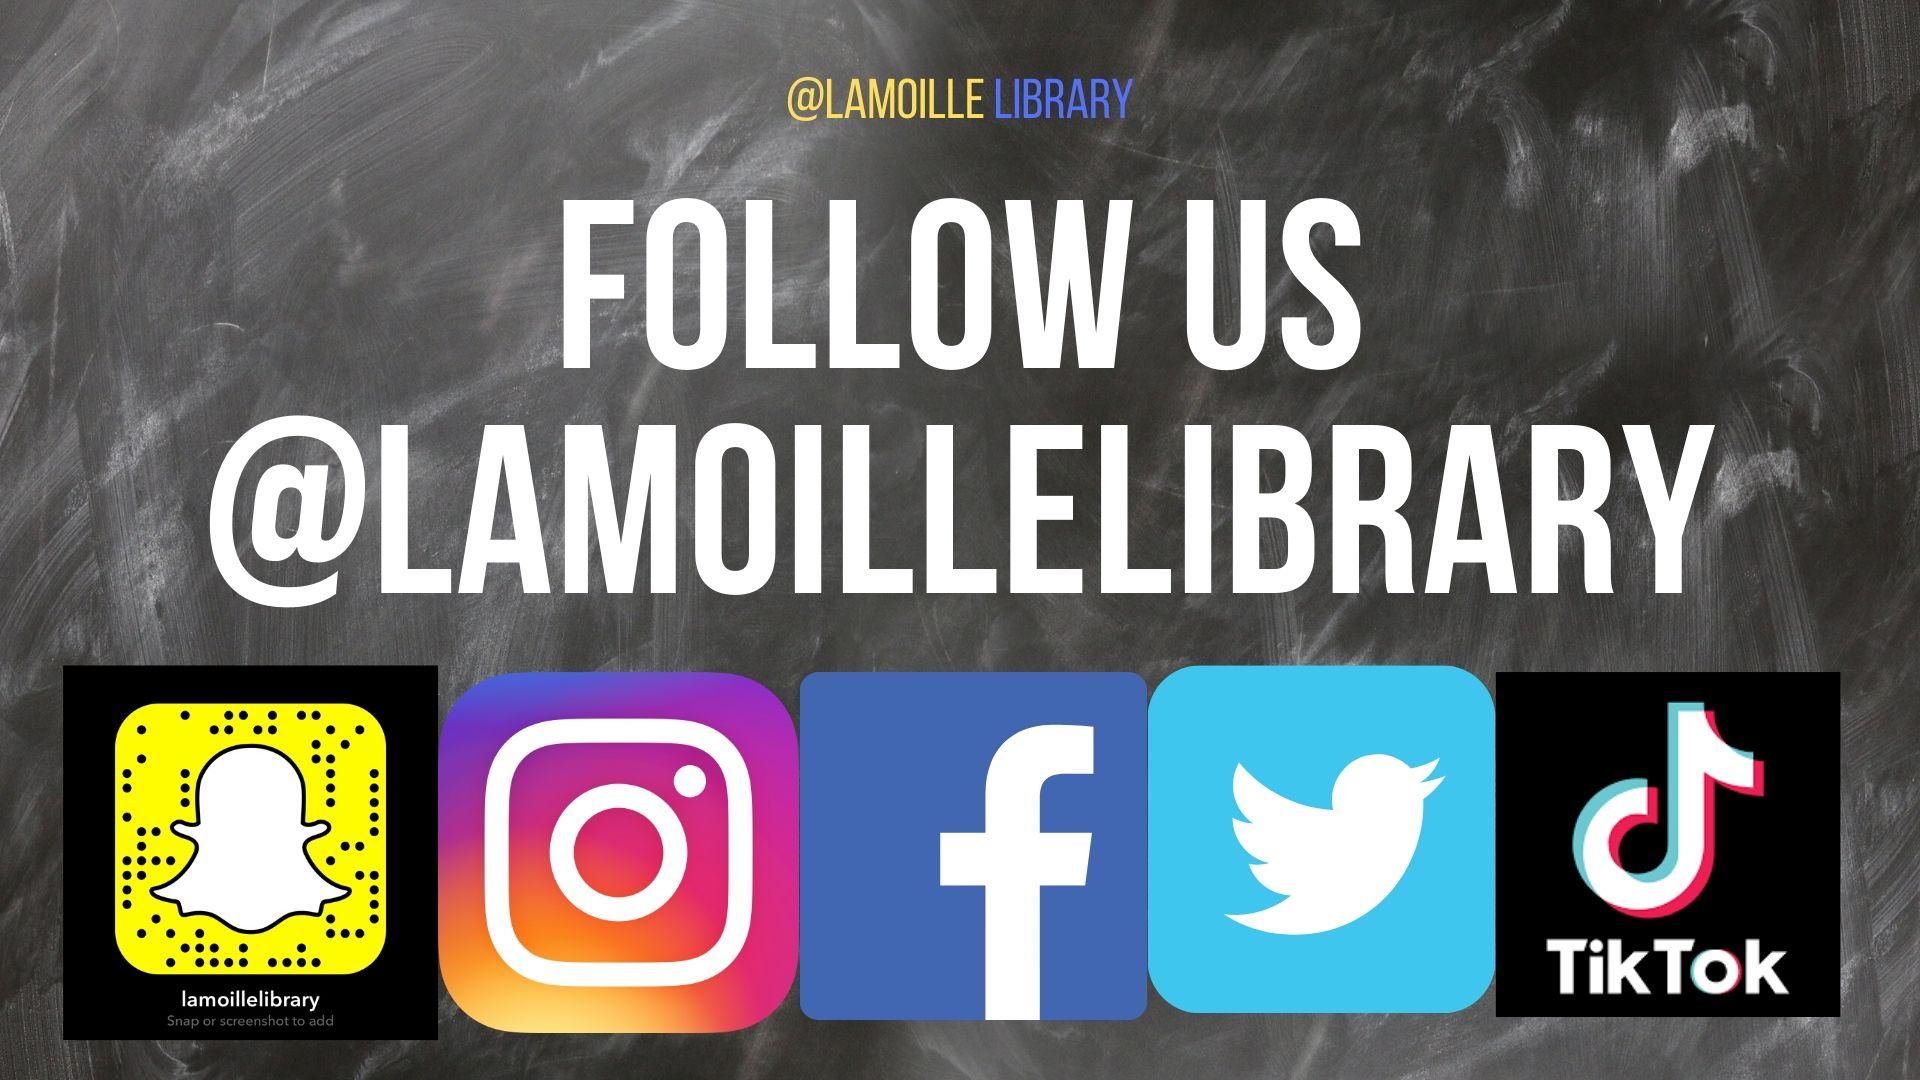 Library Socials